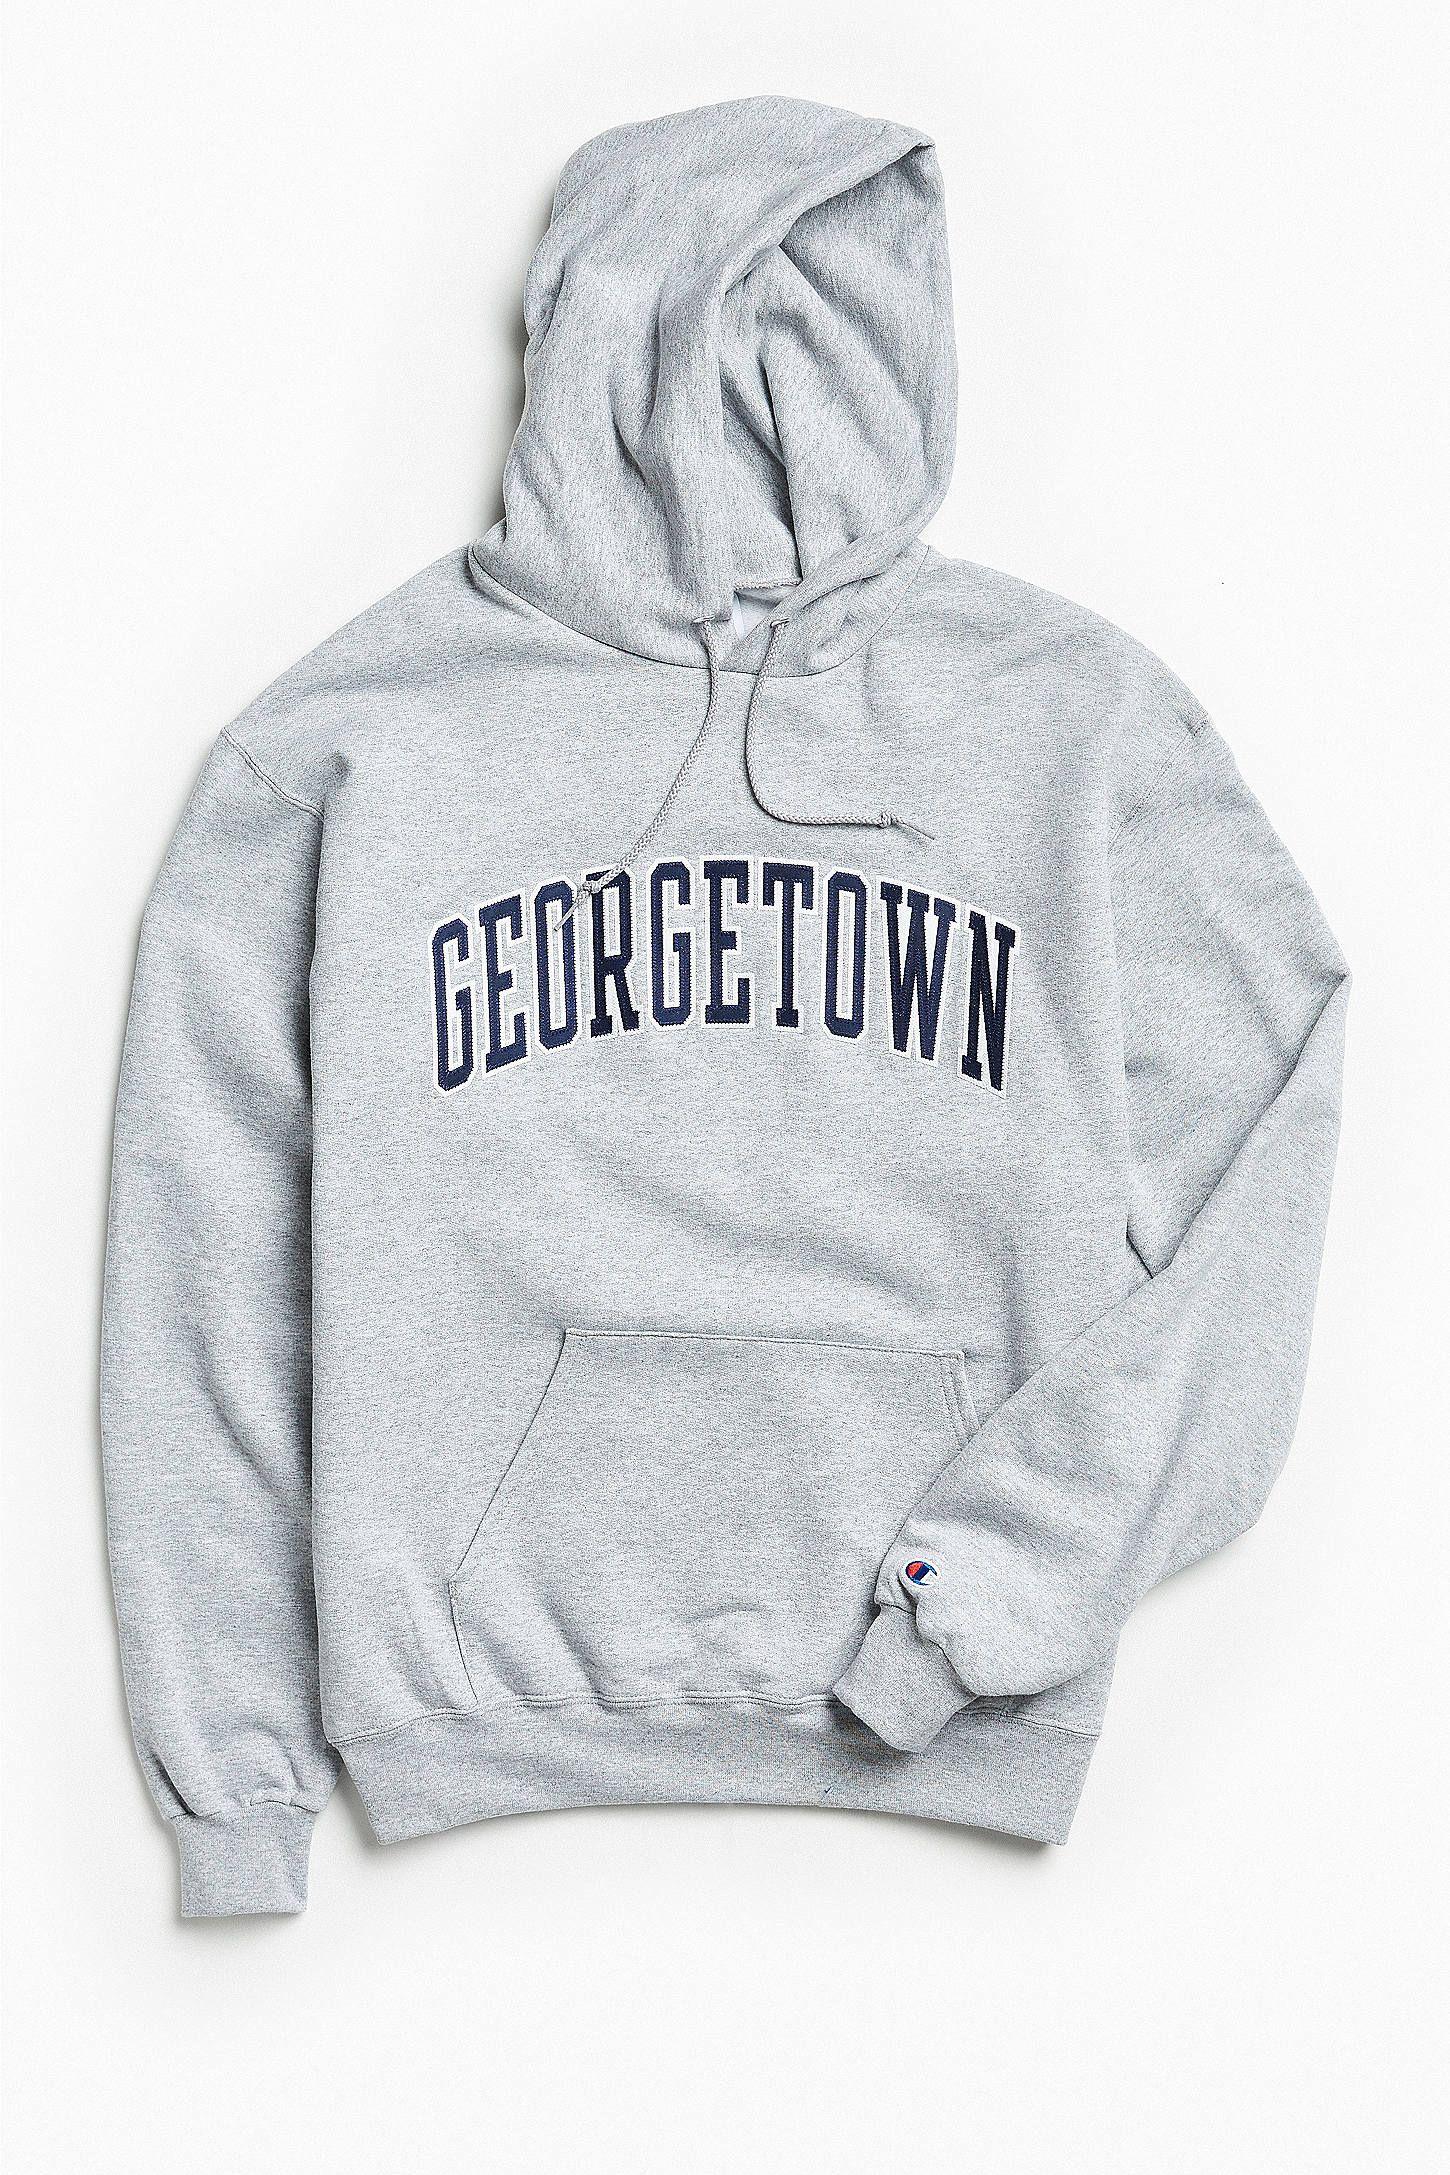 Champion Georgetown University Eco Fleece Hoodie Sweatshirt Sweatshirts Hoodie Hoodies Sweatshirts [ 2175 x 1450 Pixel ]